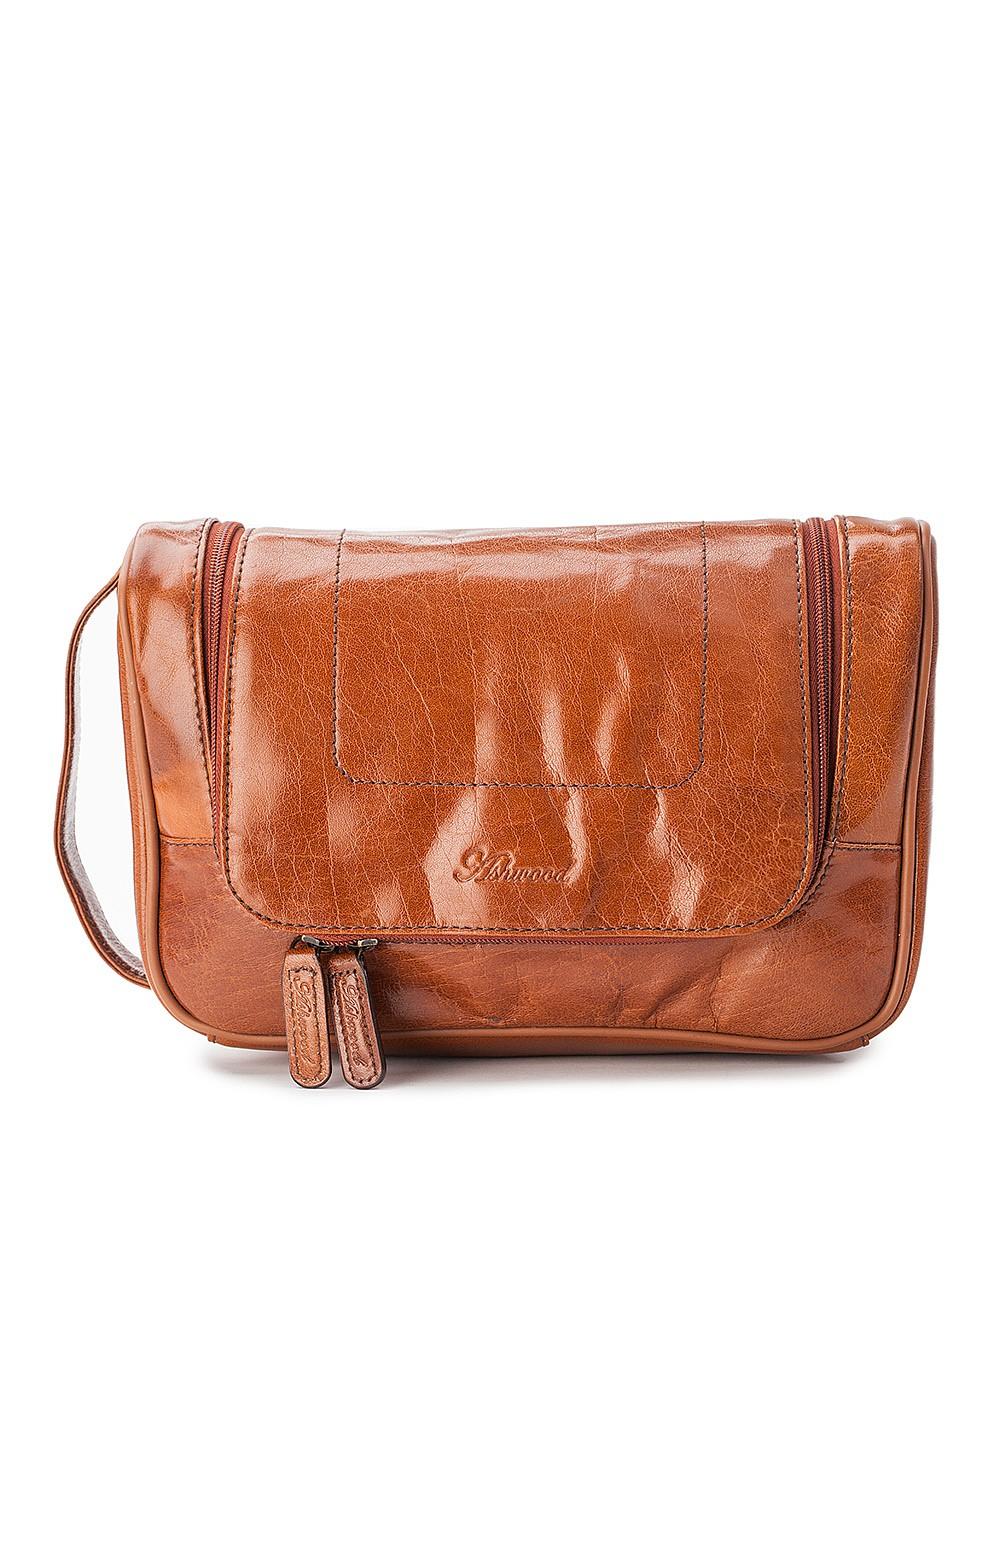 329f13b49d1 Mens Brown Leather Wash Bag Uk - Dream Shuttles